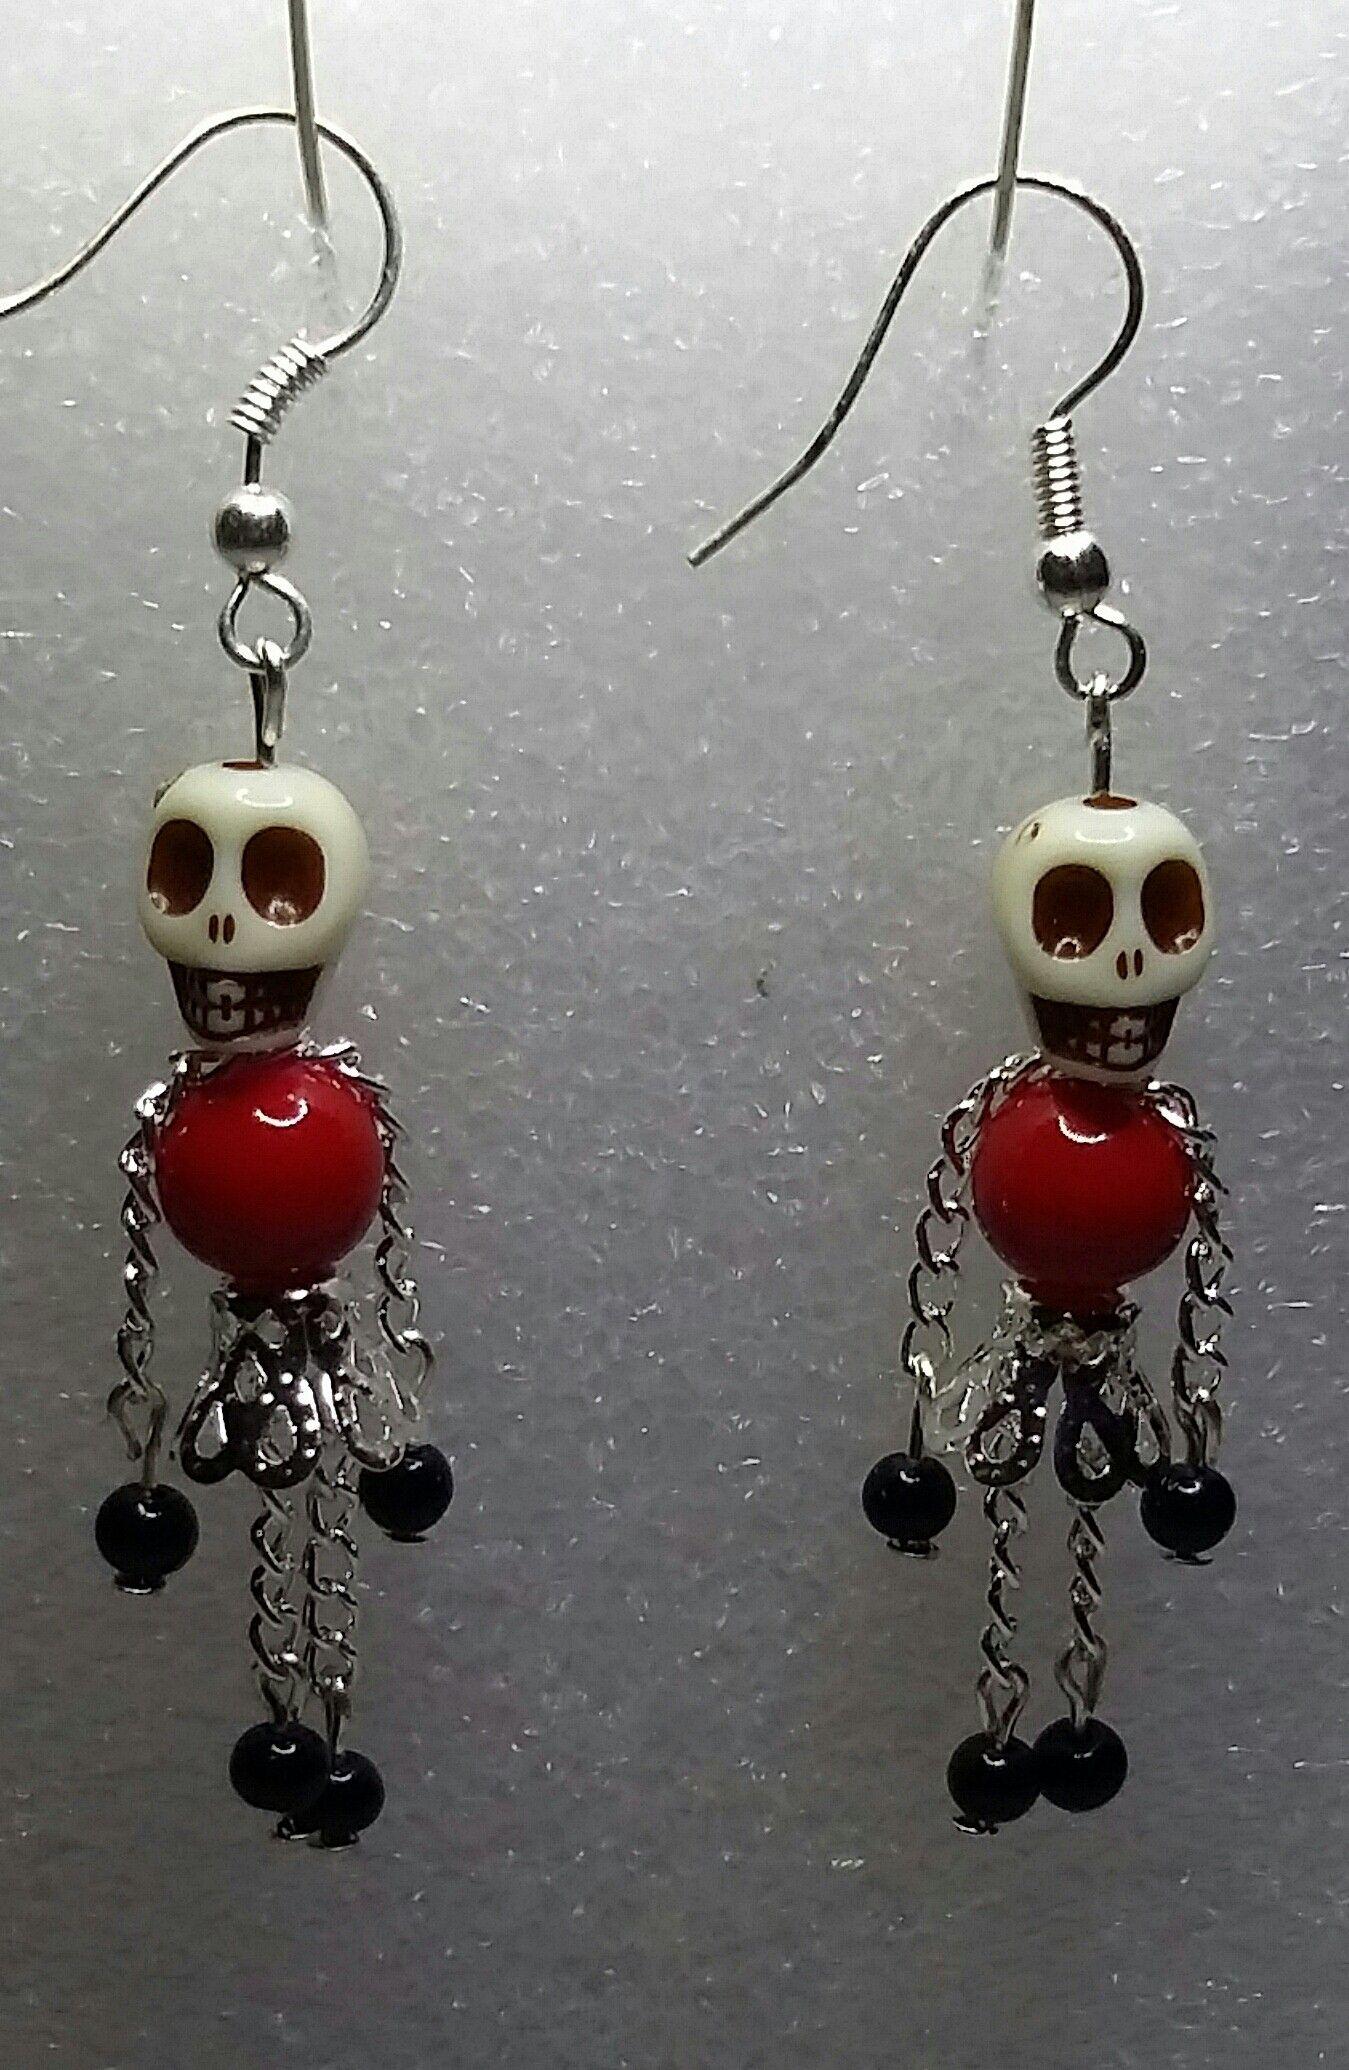 Halloween Jewelry : halloween, jewelry, Linda, Mitrik, Bisutería, Halloween, Jewelry, Funny, Jewelry,